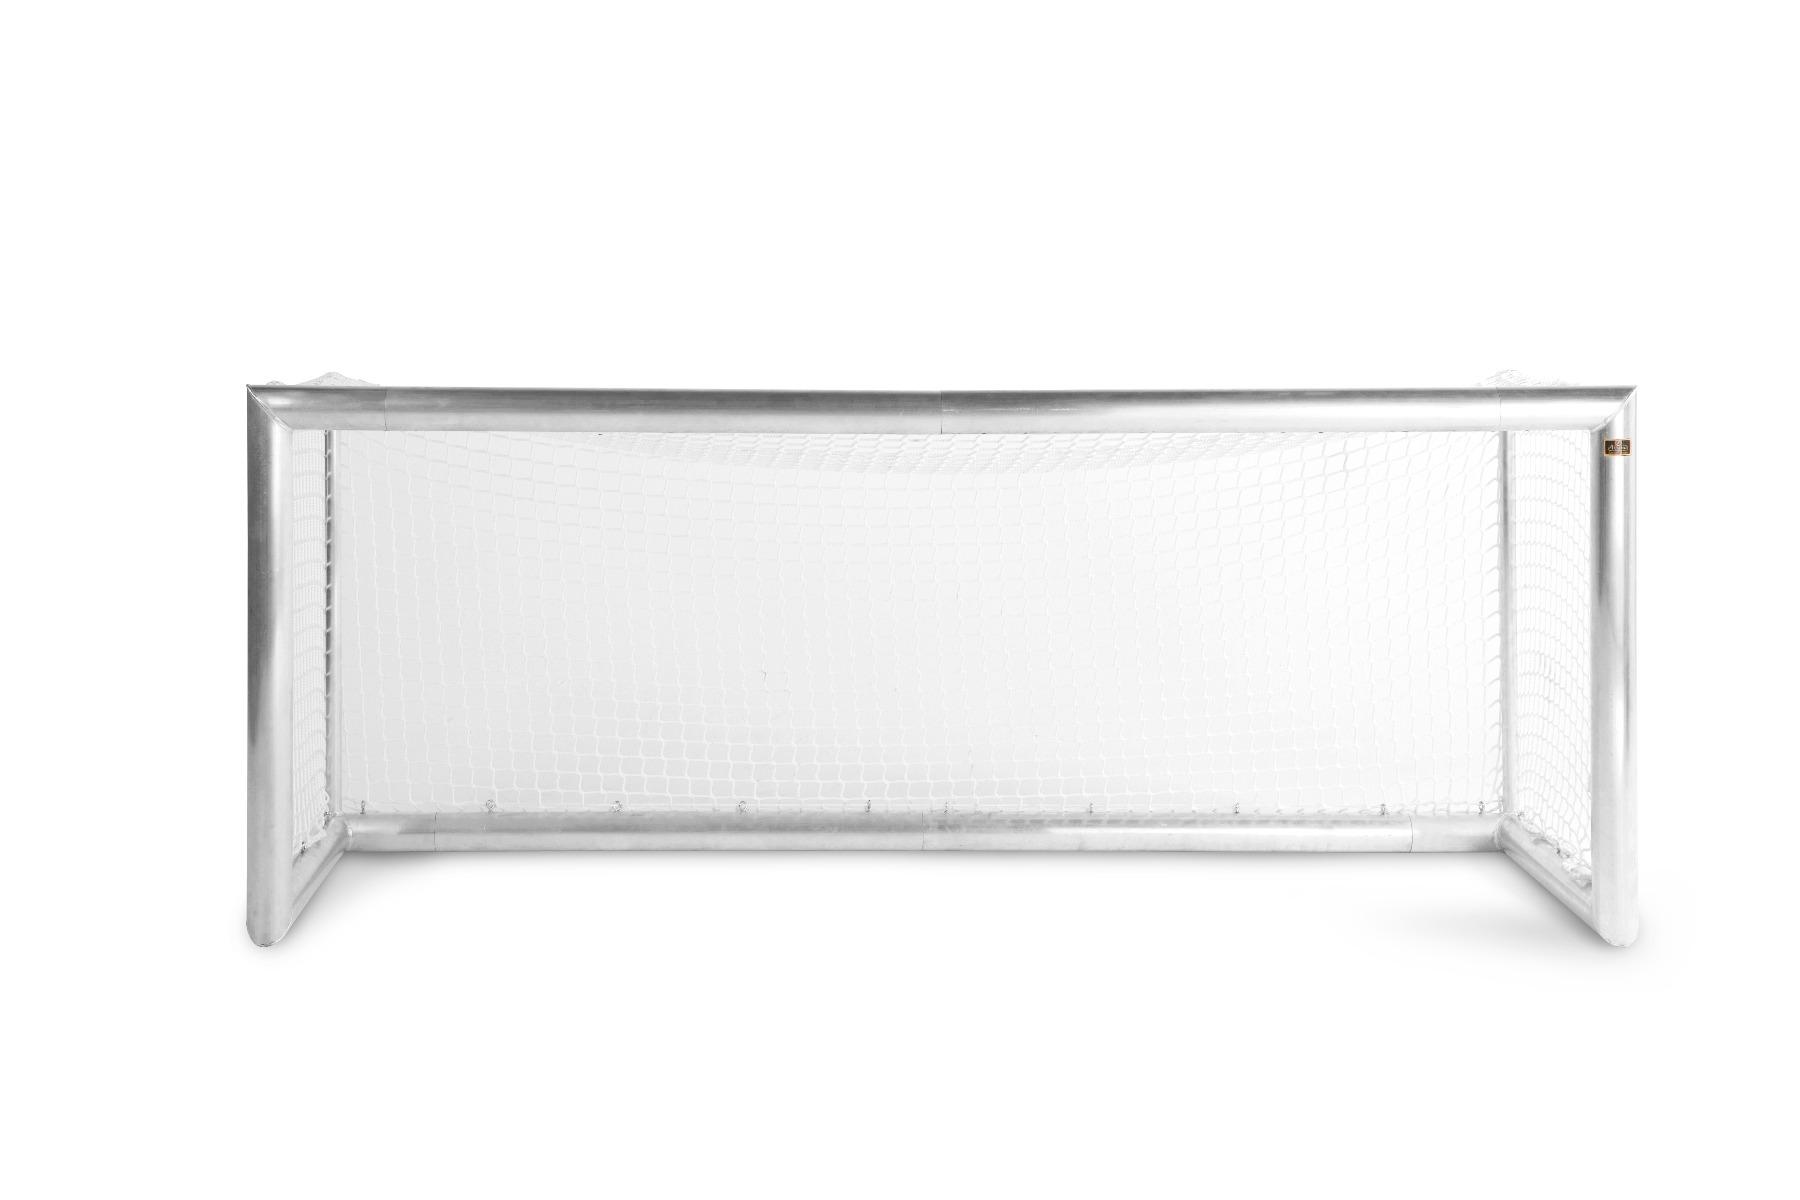 Image of 2 * Aluminium Goal 2,50 x 1,00 incl. net + Avyna-Bal 8717662619205